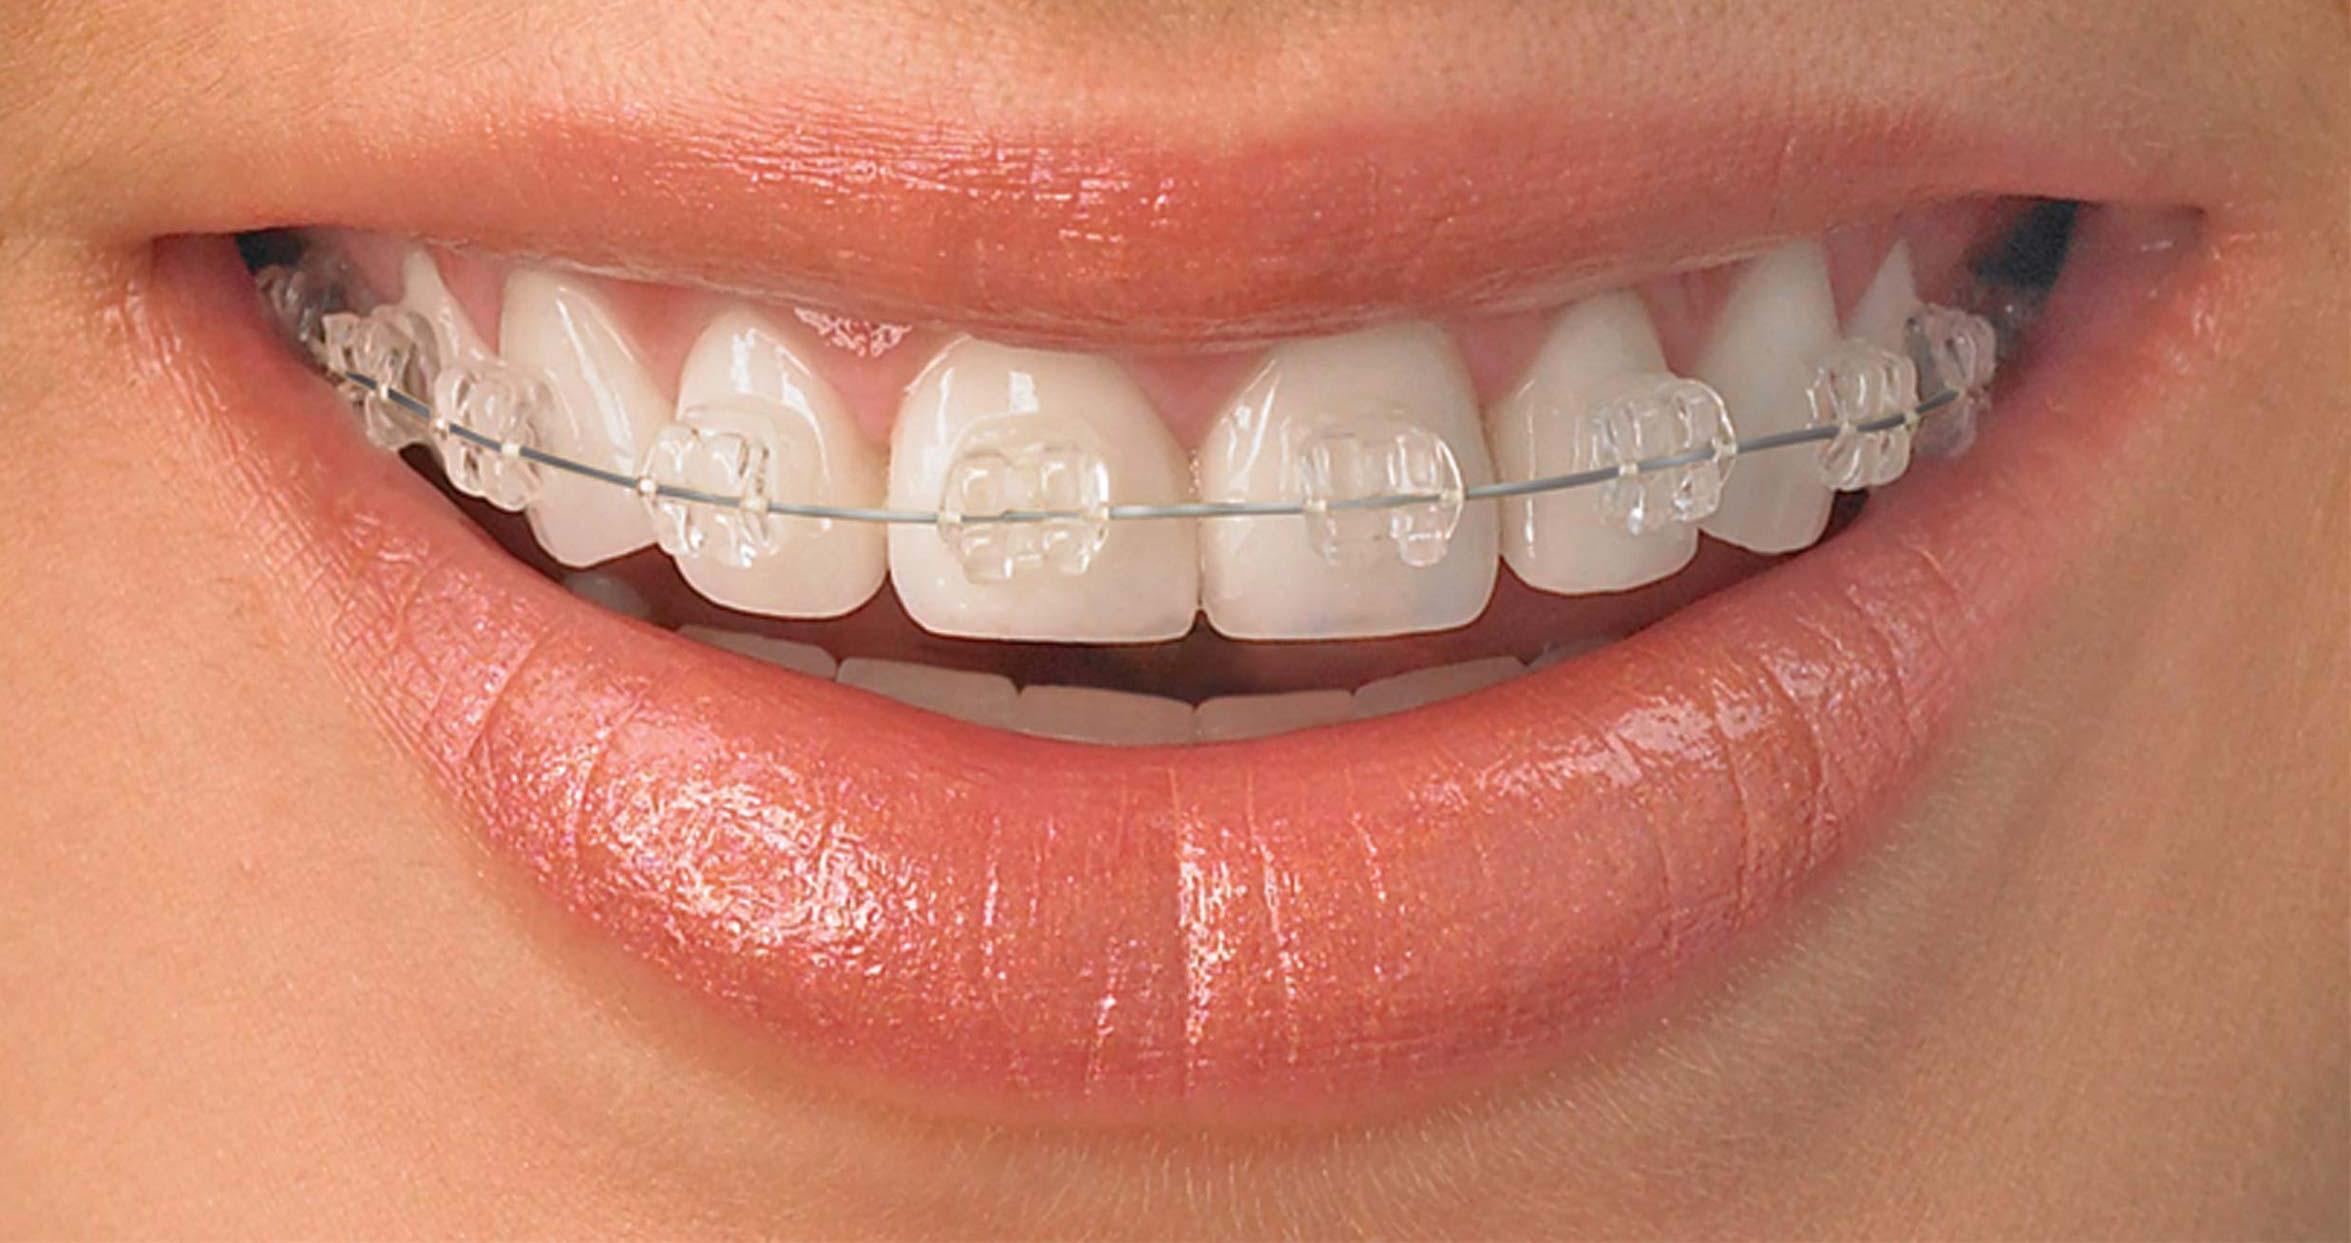 ceramic braces, supplied by Surbiton Smile Dental Centre, Surbiton, Surrey UK